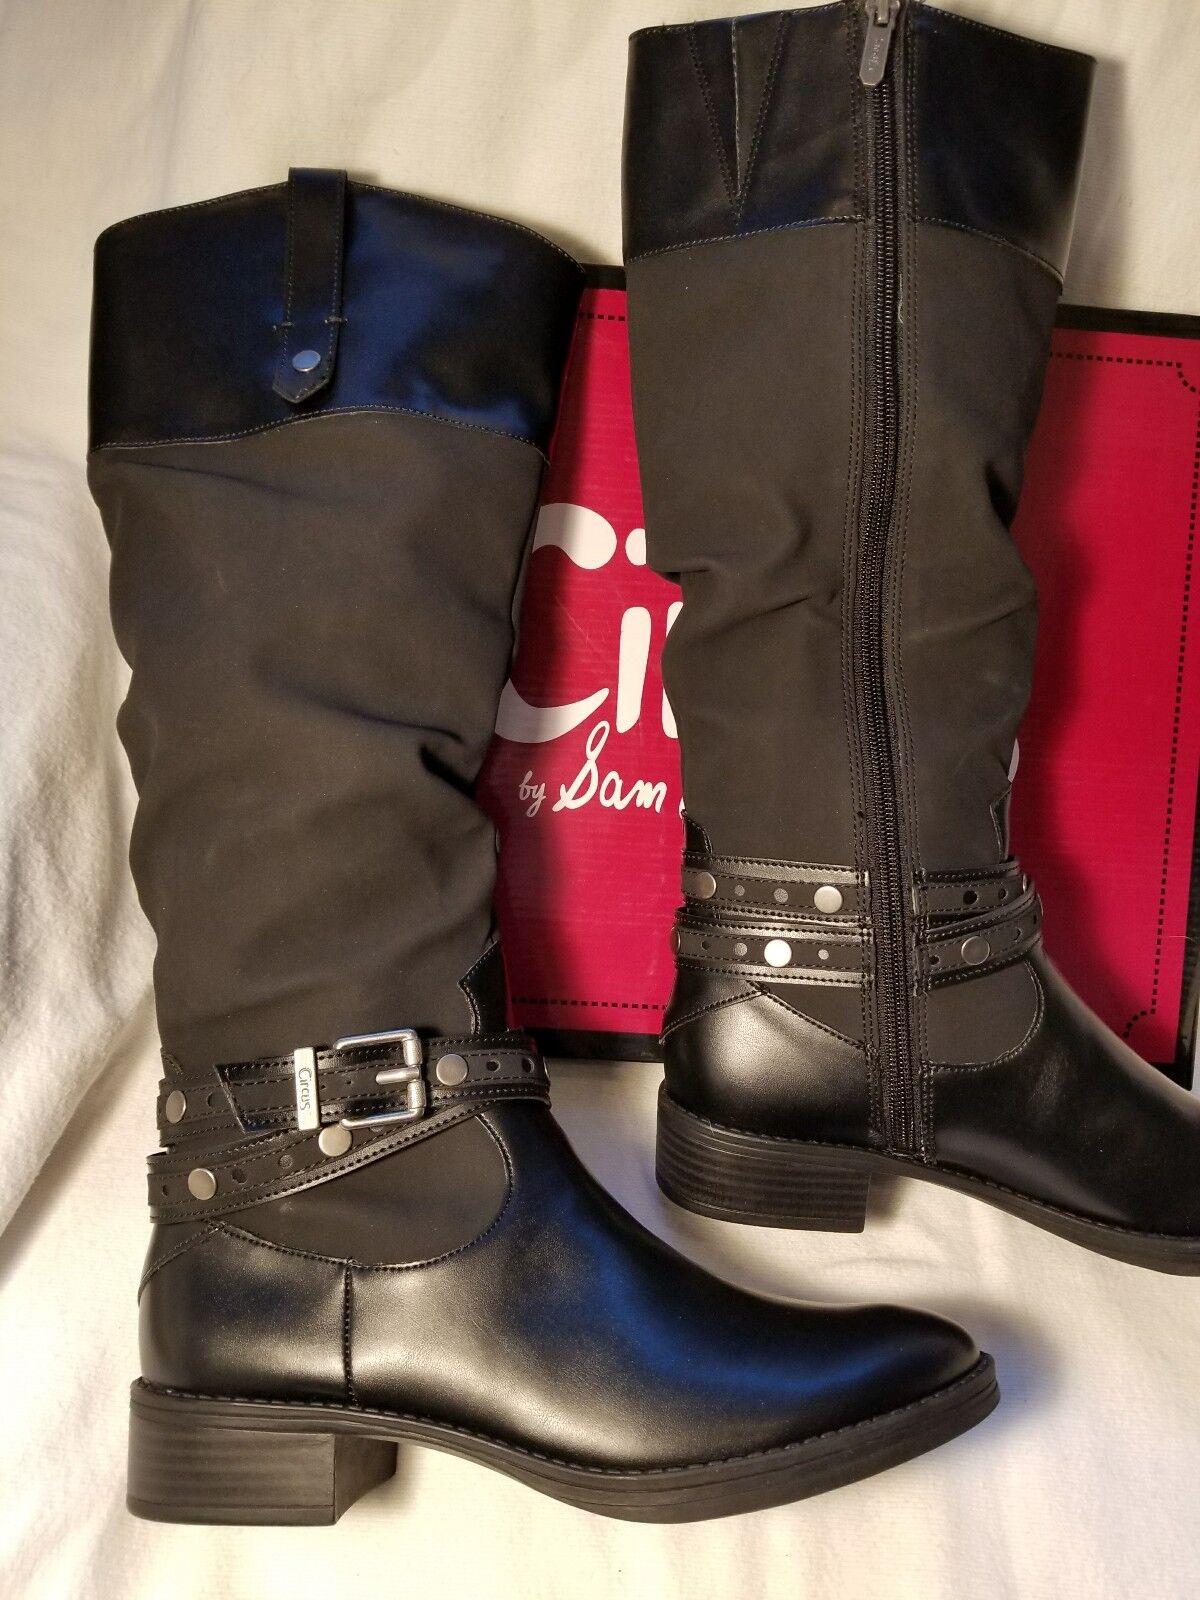 ee011a3574d85 Buy Circus Sam Edelman Paxton Black Leather Rider Knee High Block ...